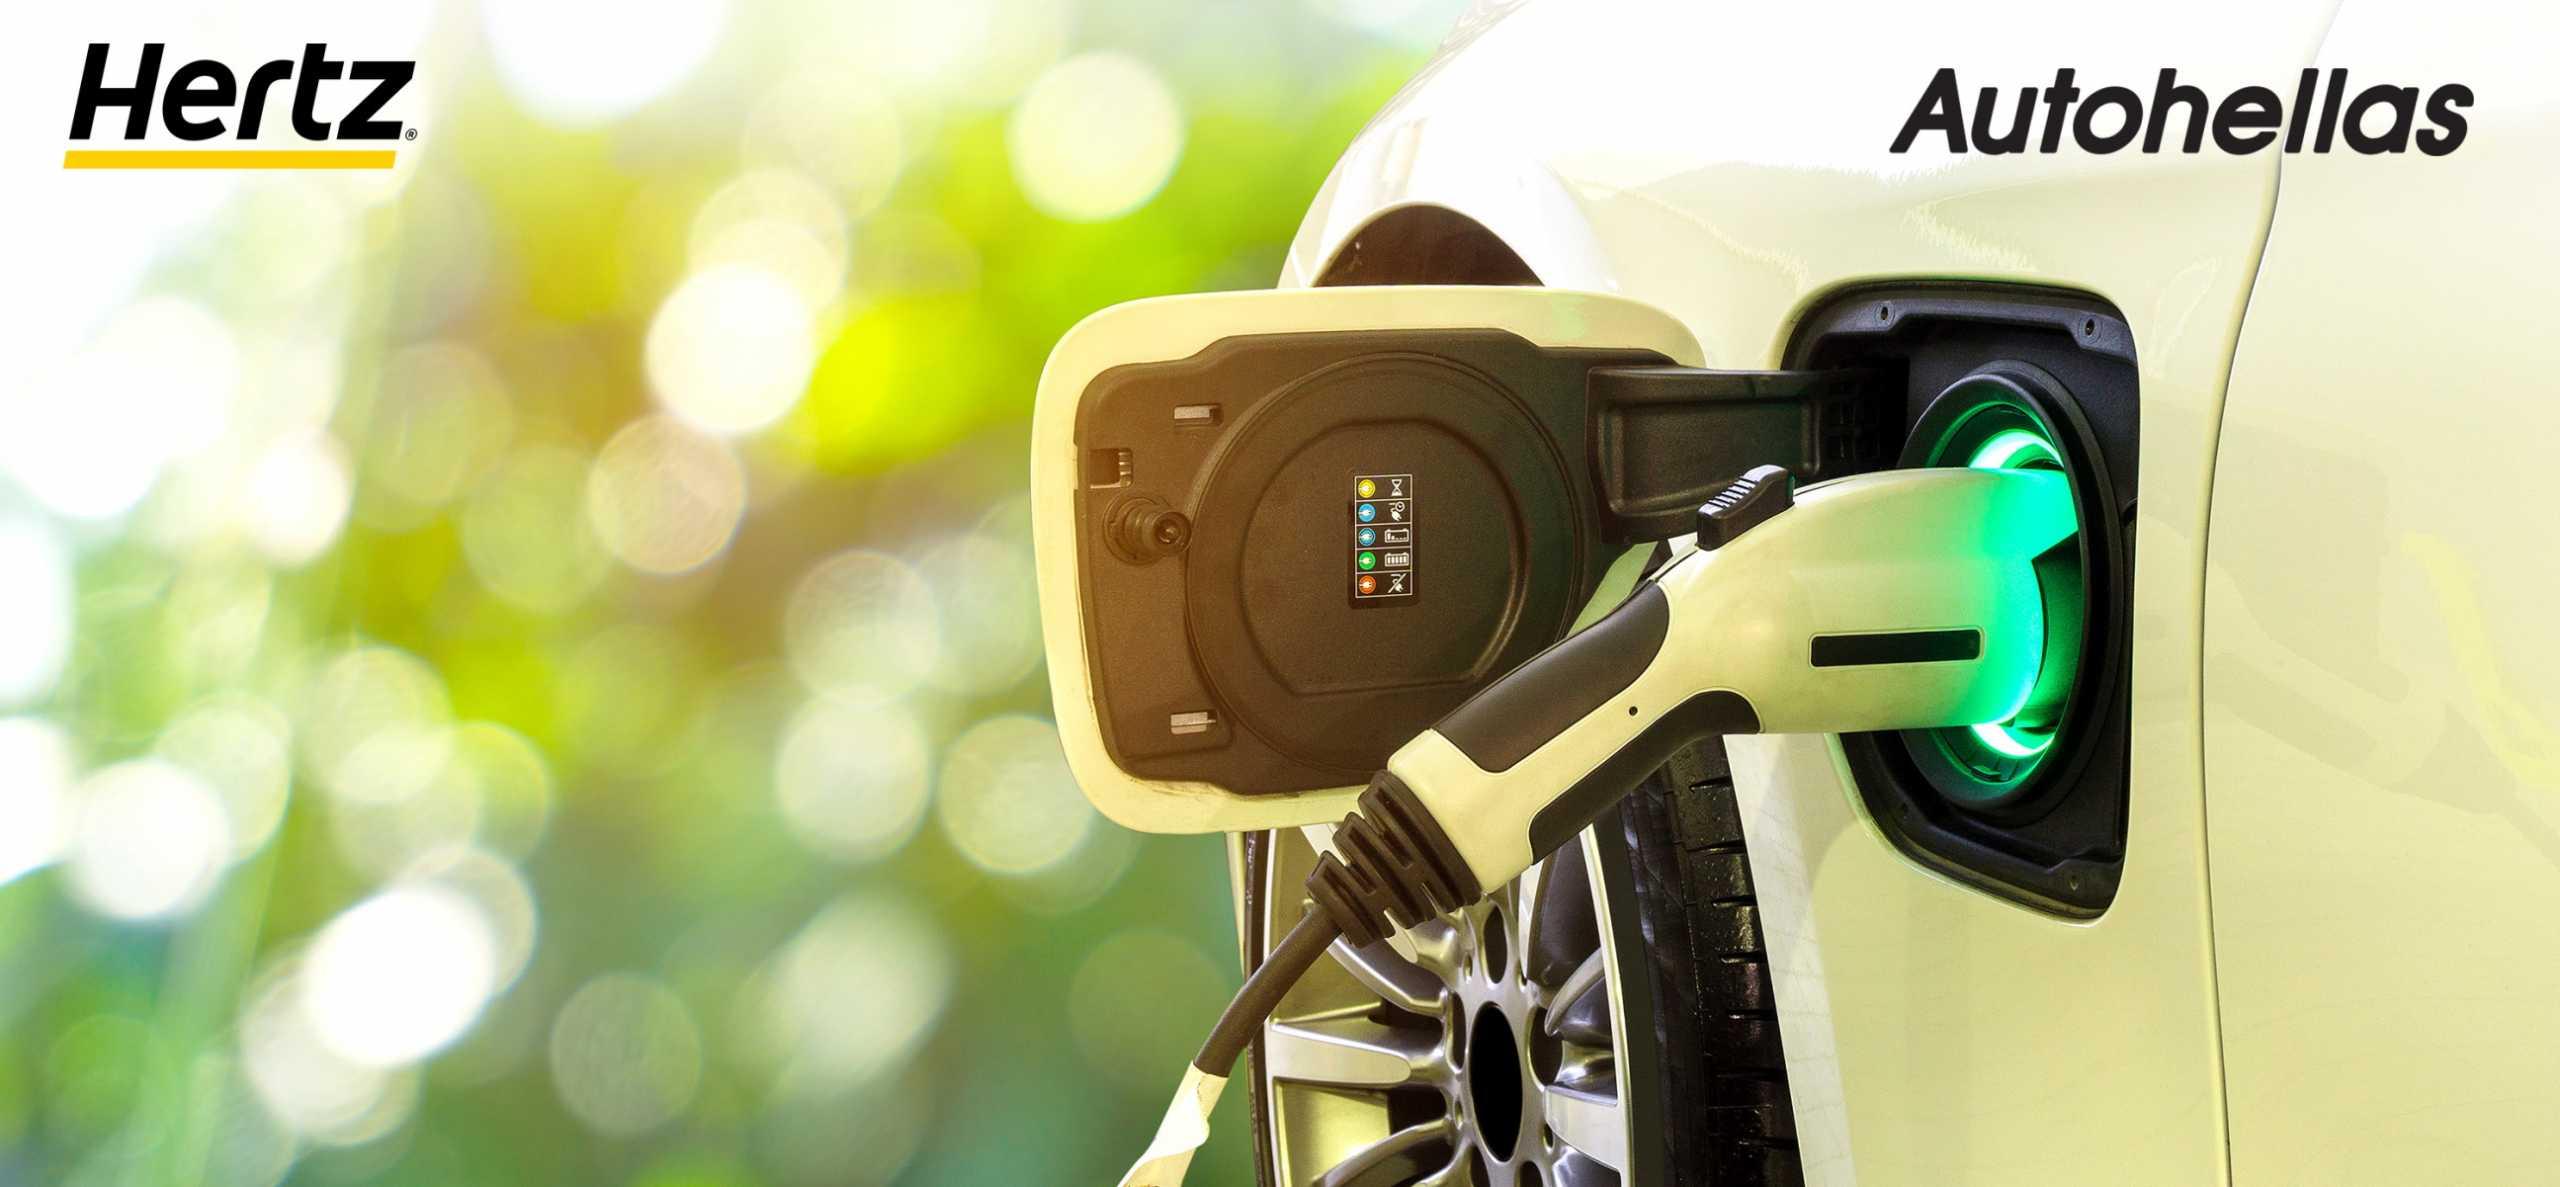 Autohellas Hertz: Ενισχύει το στόλο με ηλεκτροκίνητα αυτοκίνητα